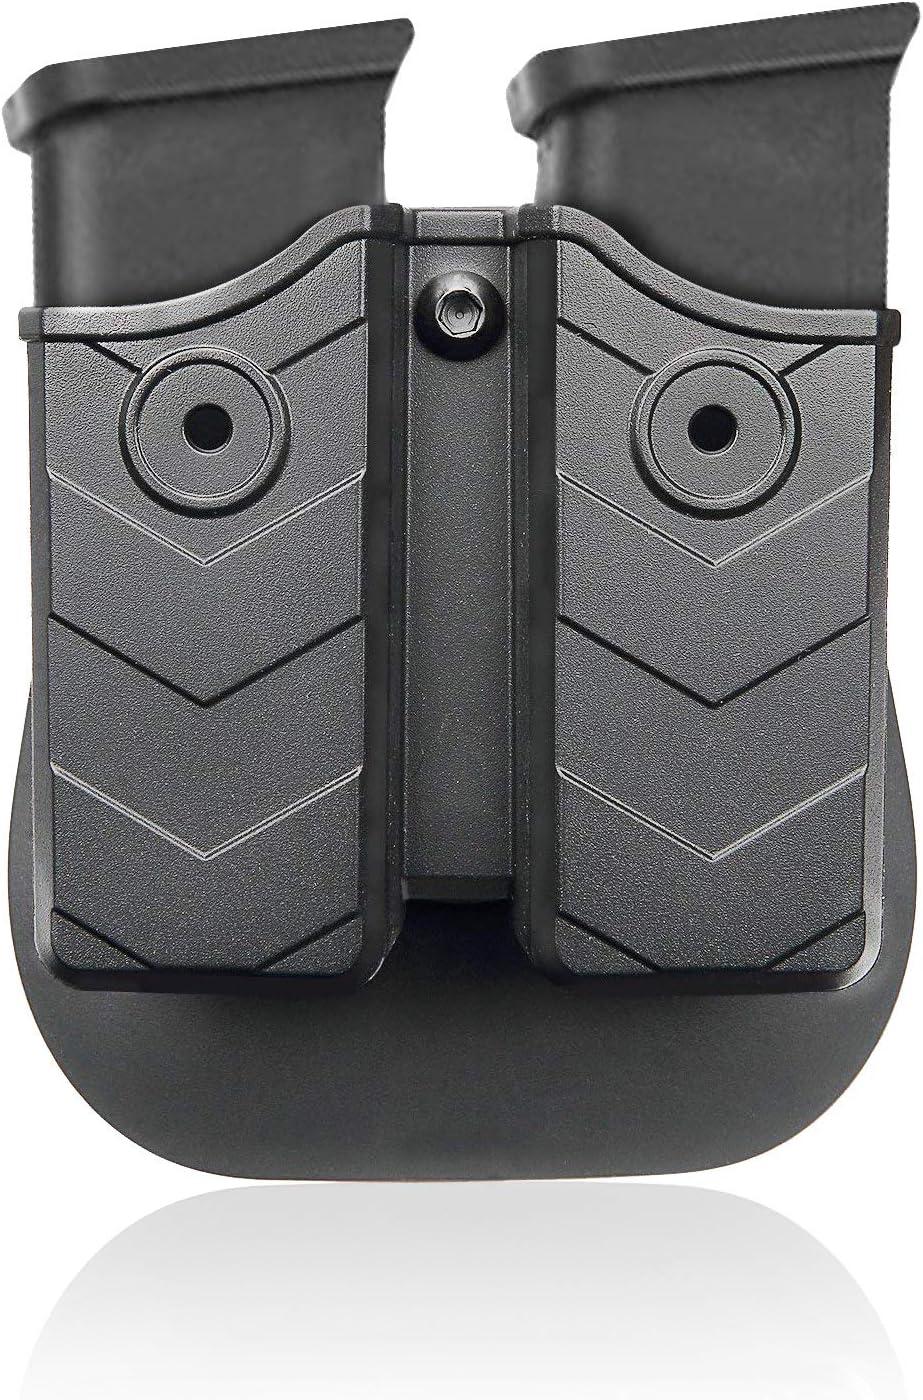 efluky Universal Portacargador Doble Portacargador Funda para Pistola Cargador Bolsa para H&K USP FS/Compact 9mm/.40/Beretta/Golck 17 19/Beretta/CZ 75/Walther P99/Sig Sauer p226, Paddle 60°Adjusta